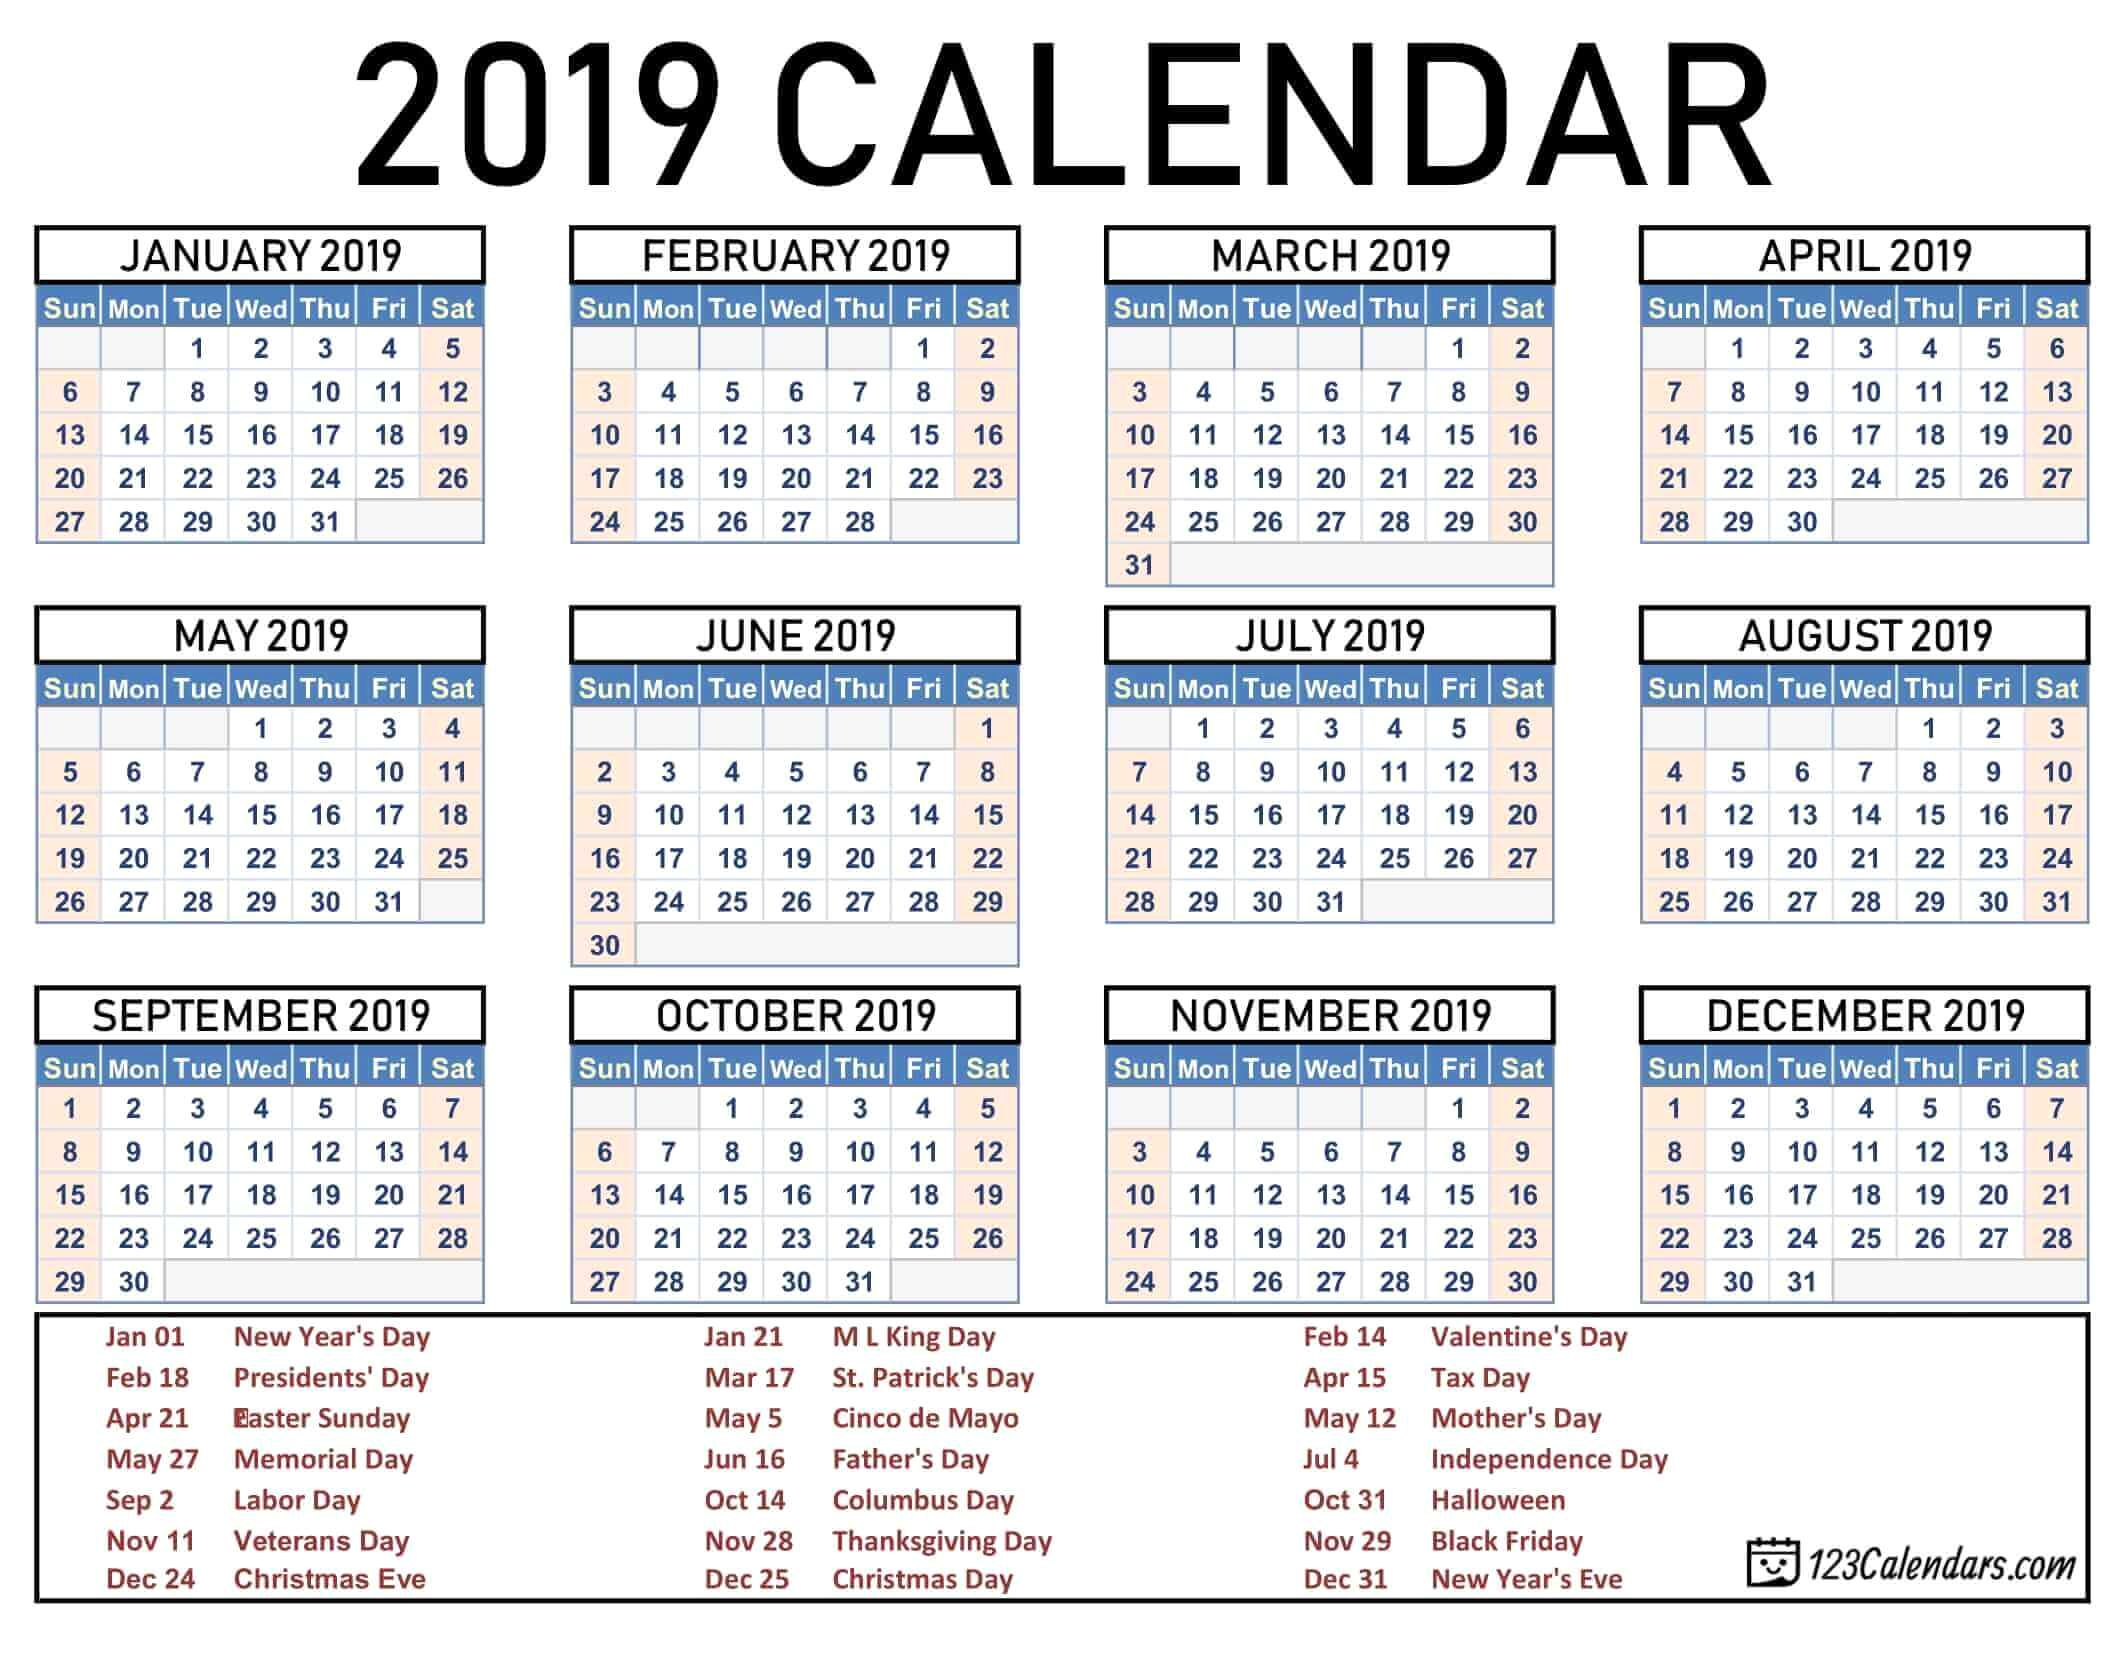 2015 And 2020 School Calendar Printable - Togo.wpart.co